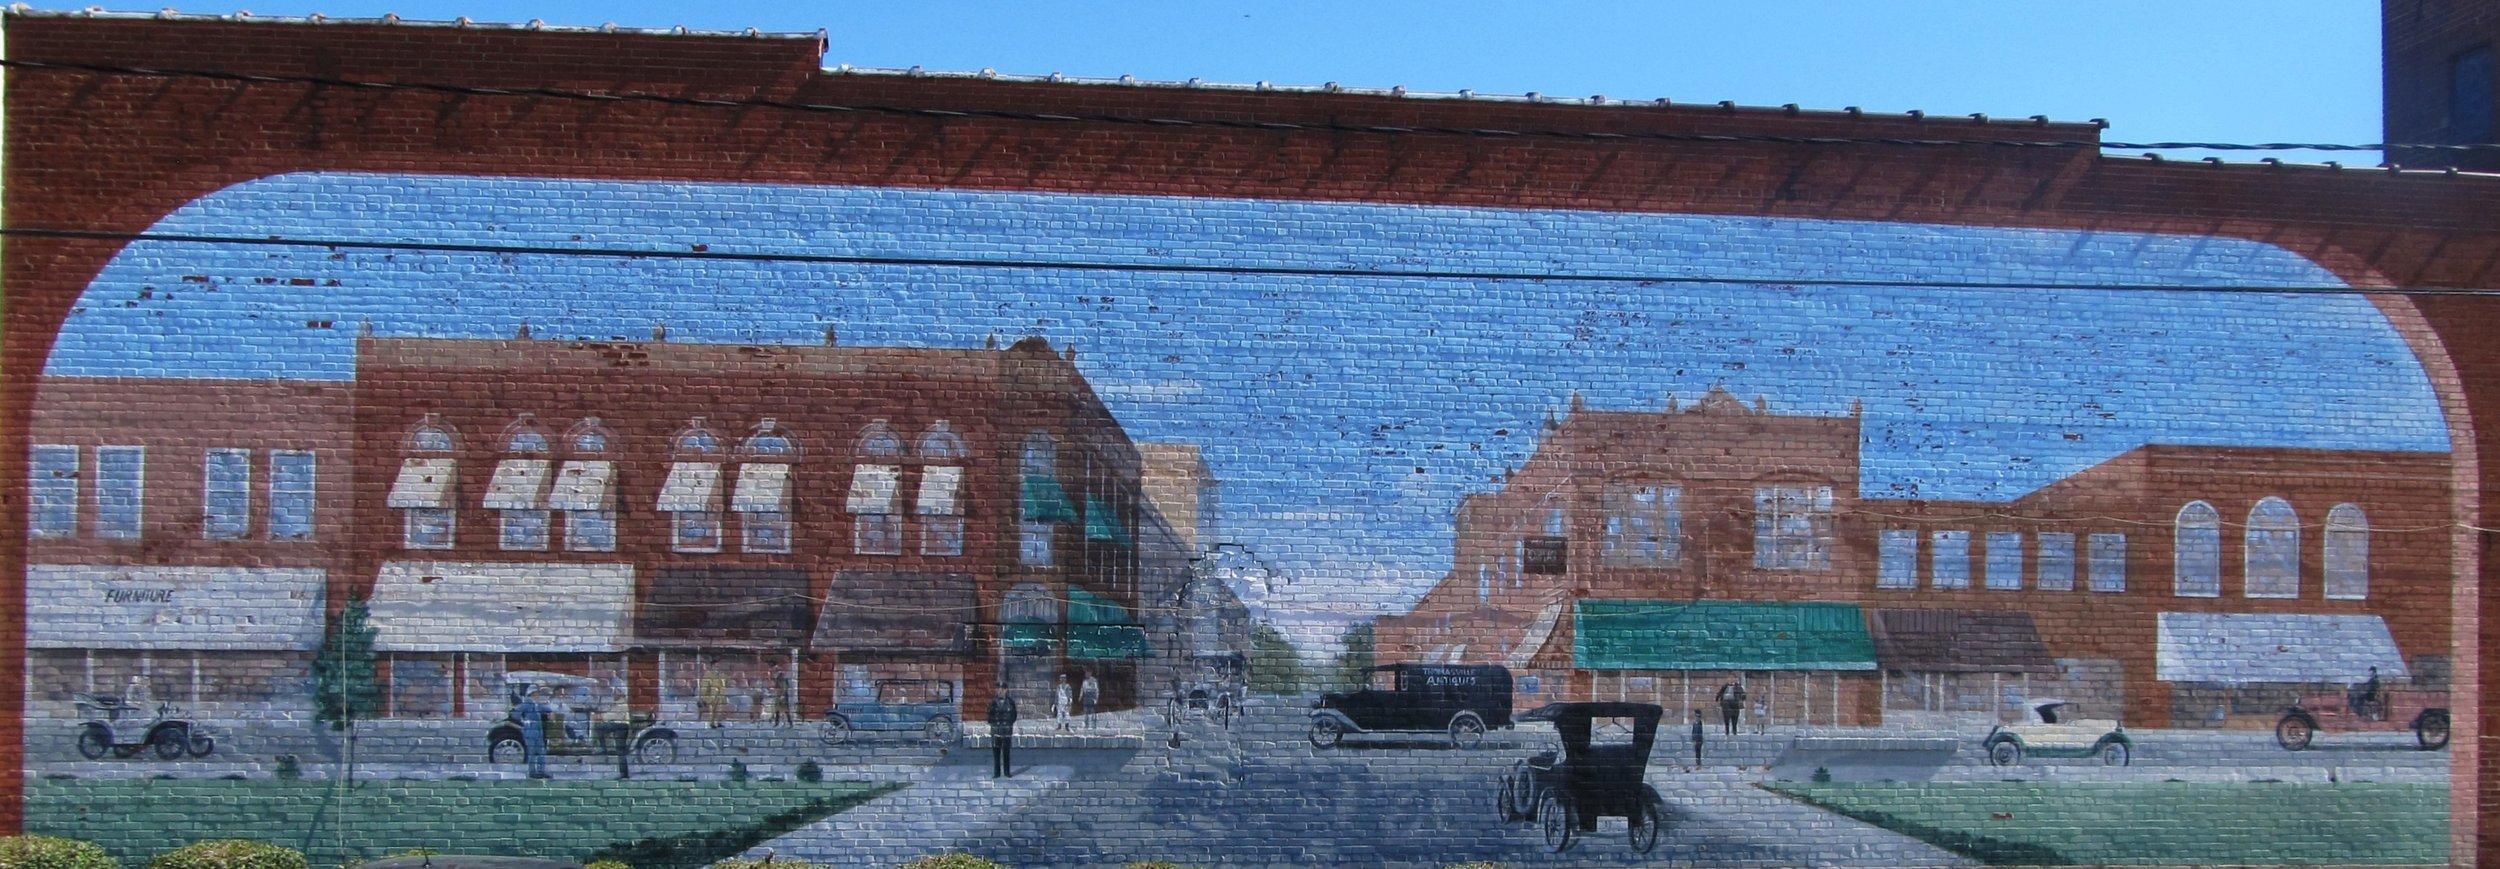 Randolph St Mural.jpg